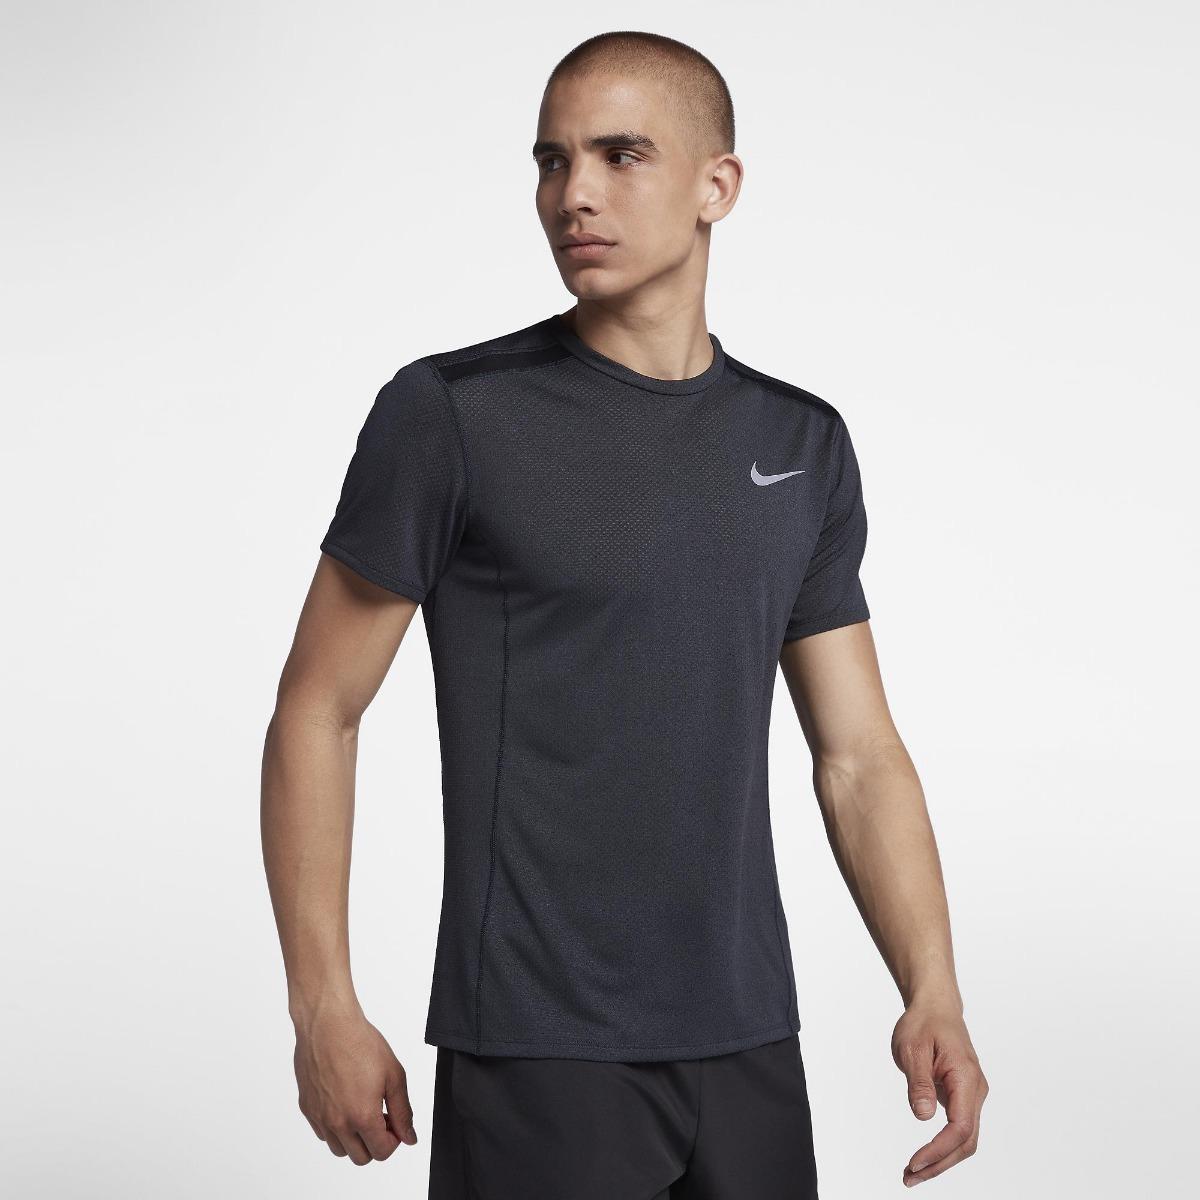 5e7f72800d camiseta nike dri-fit miler cool masculina cinza original+nf. Carregando  zoom.